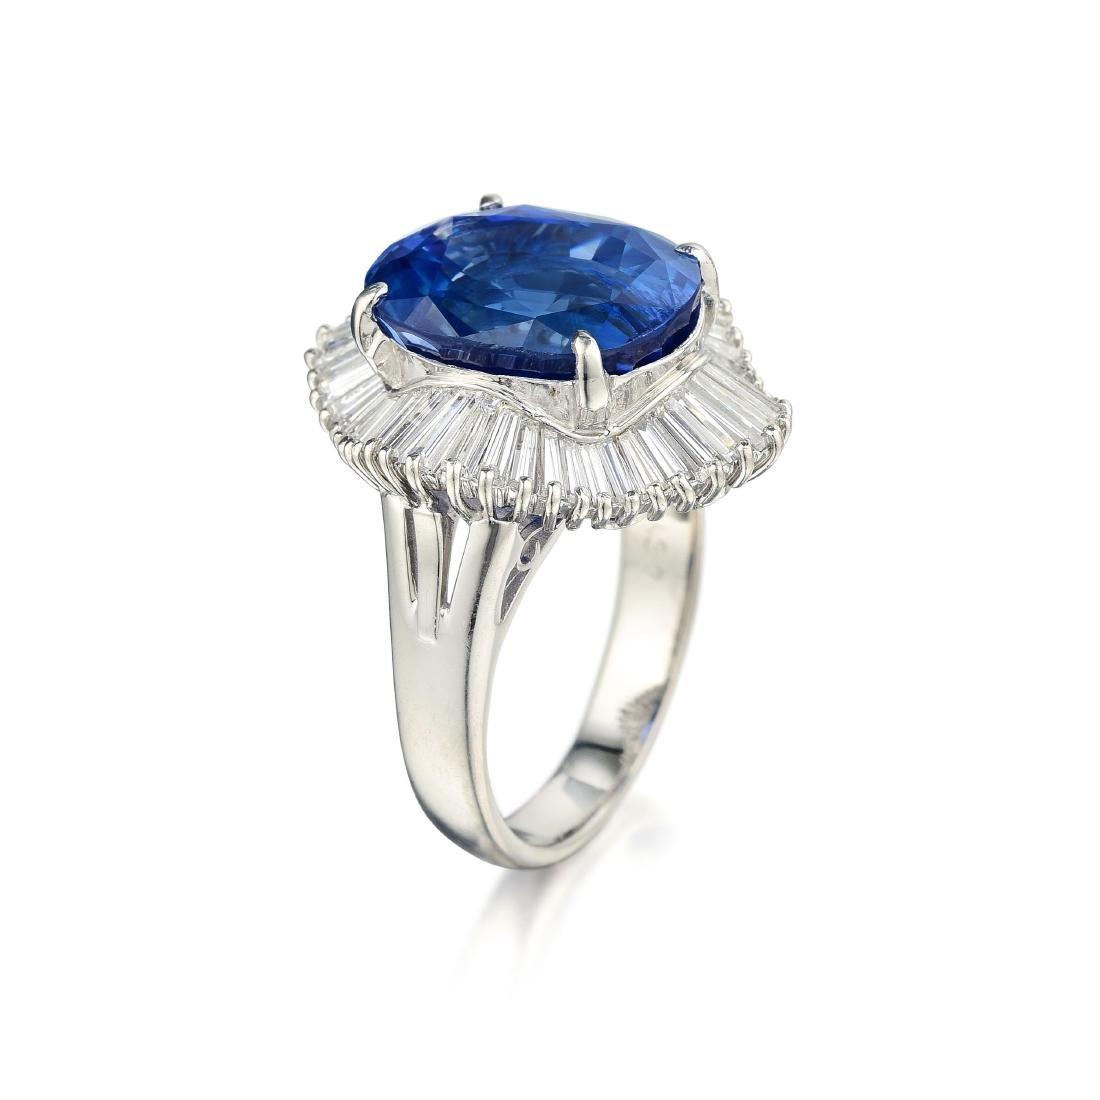 A 10.24-Carat Sapphire and Diamond Ballerina Ring - 2